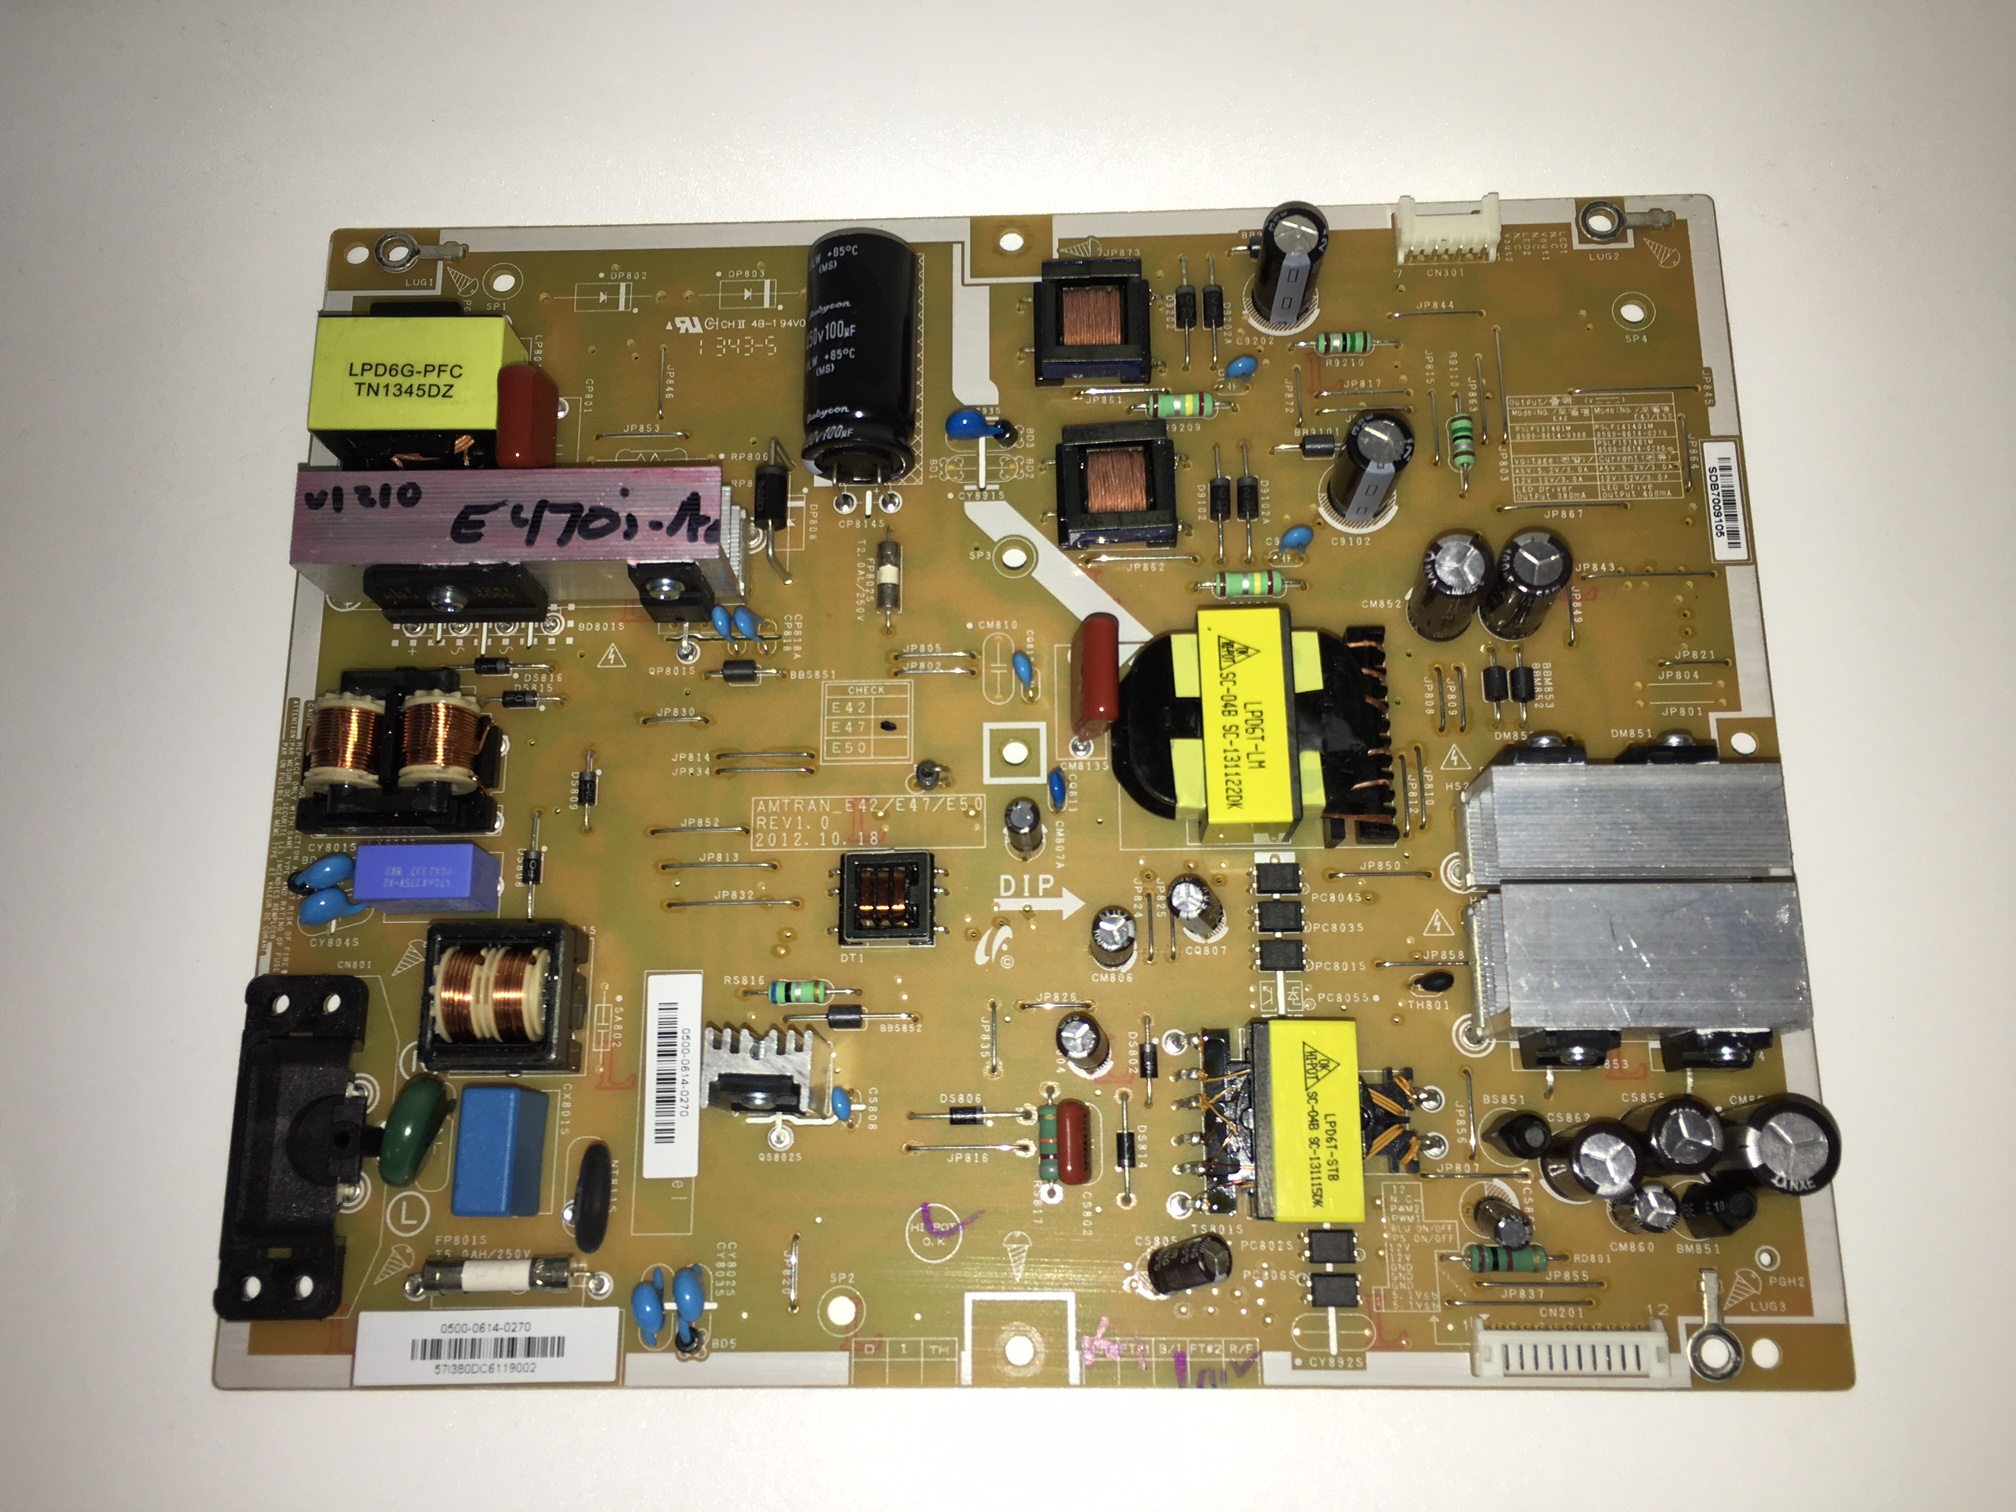 Vizio 0500-0614-0270 (PSLF141401M) Power Supply / LED Board for E470i-A0